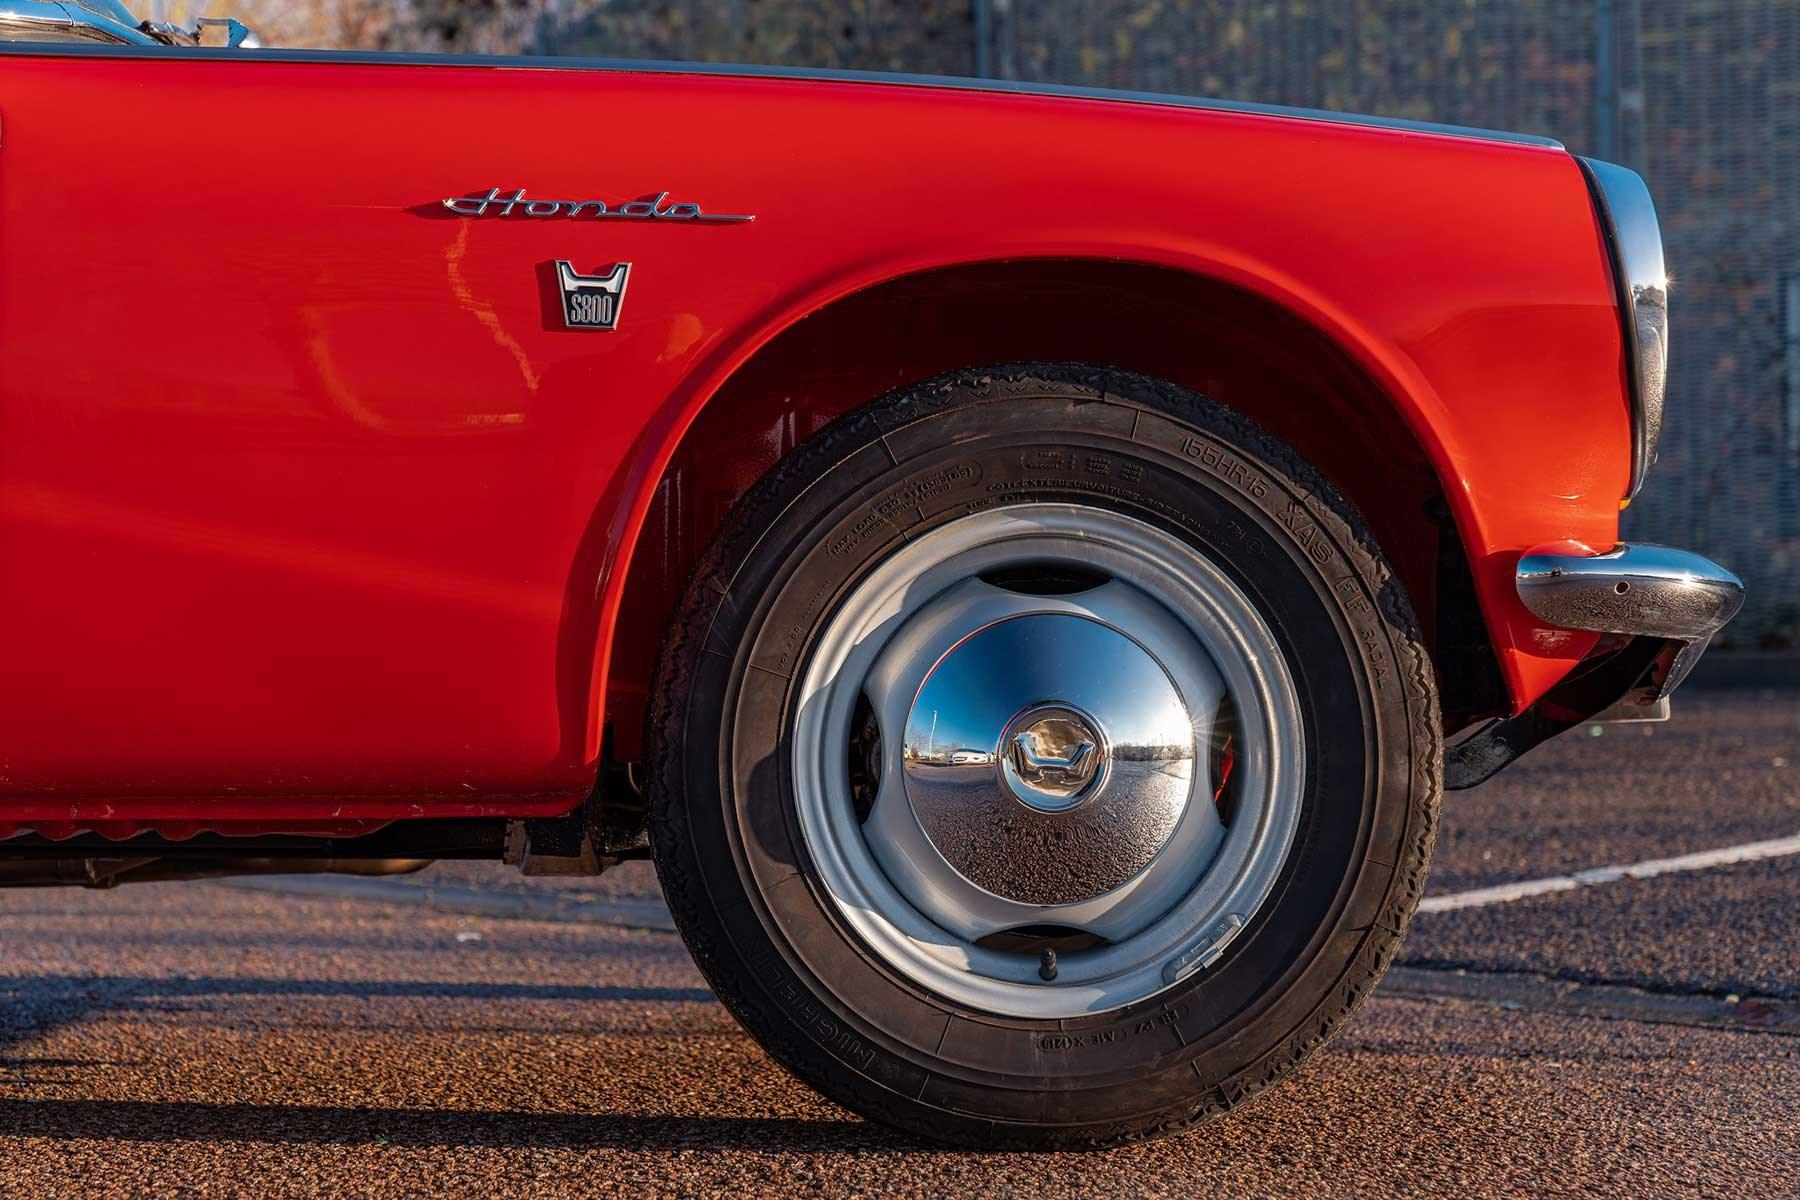 Honda S800 bonnet and wheel